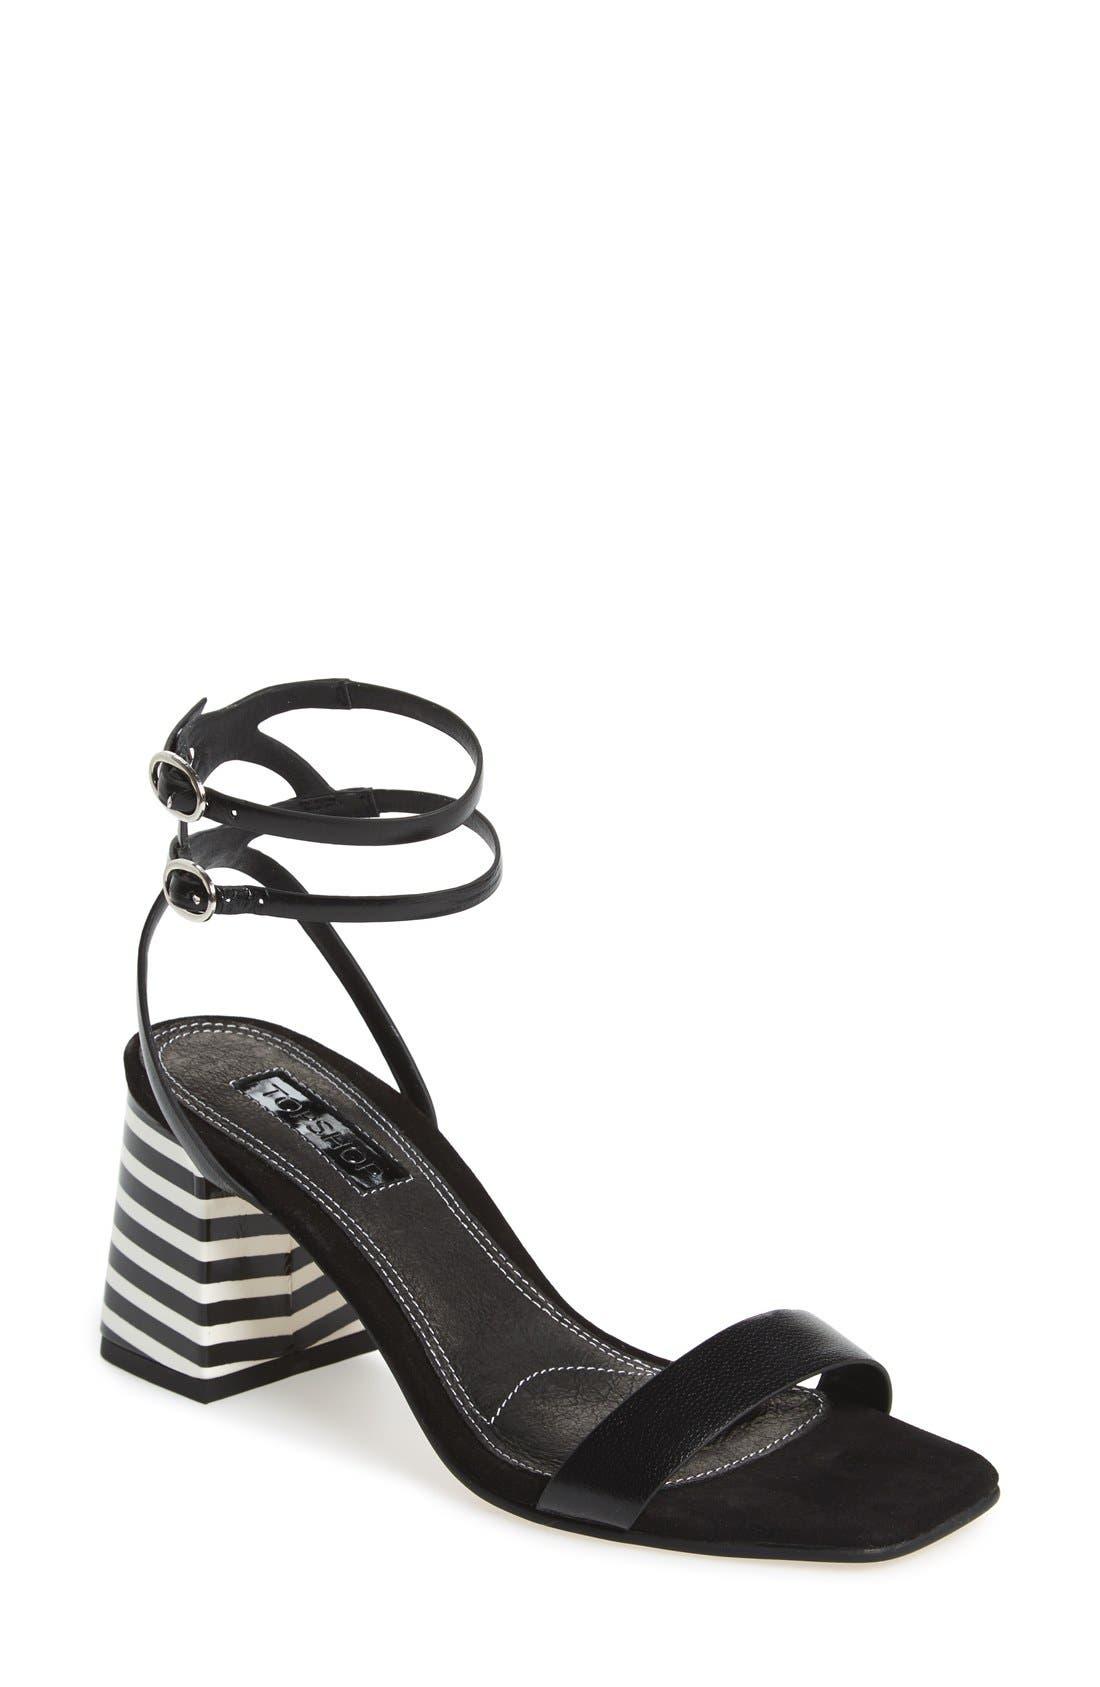 Main Image - Topshop 'Nipper' Ankle Wrap Sandal (Women)